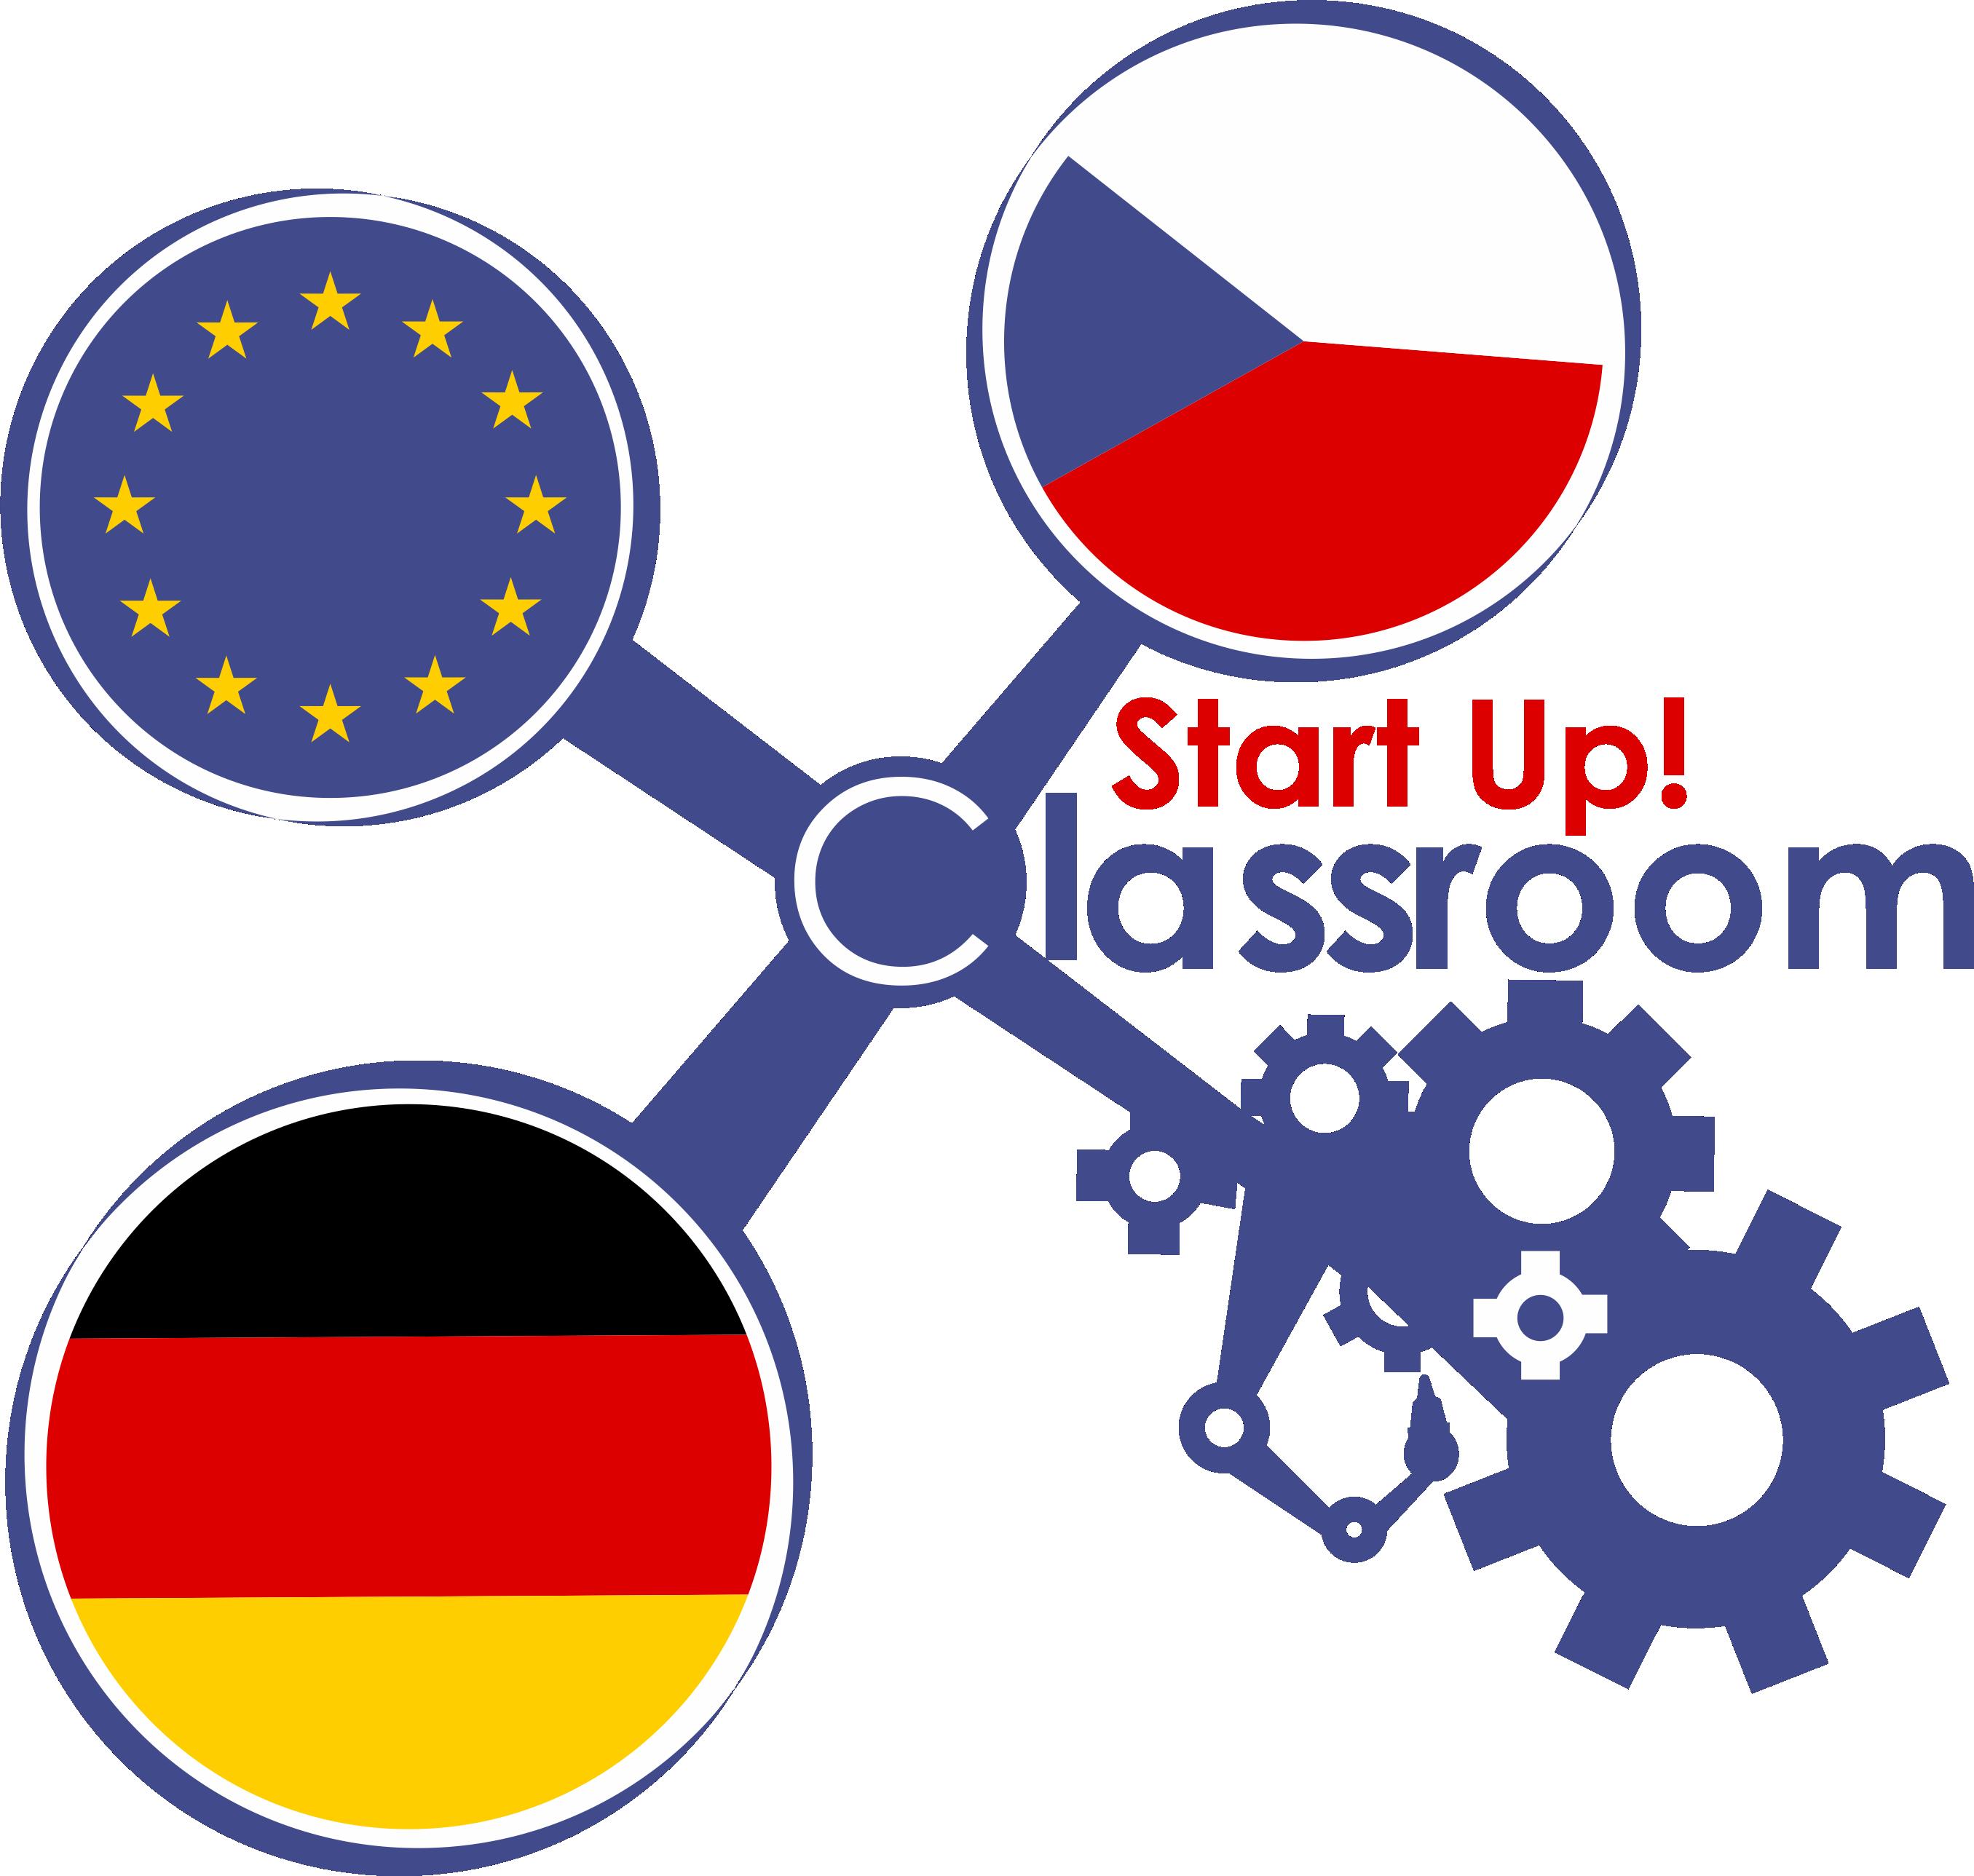 Startup! Classroom